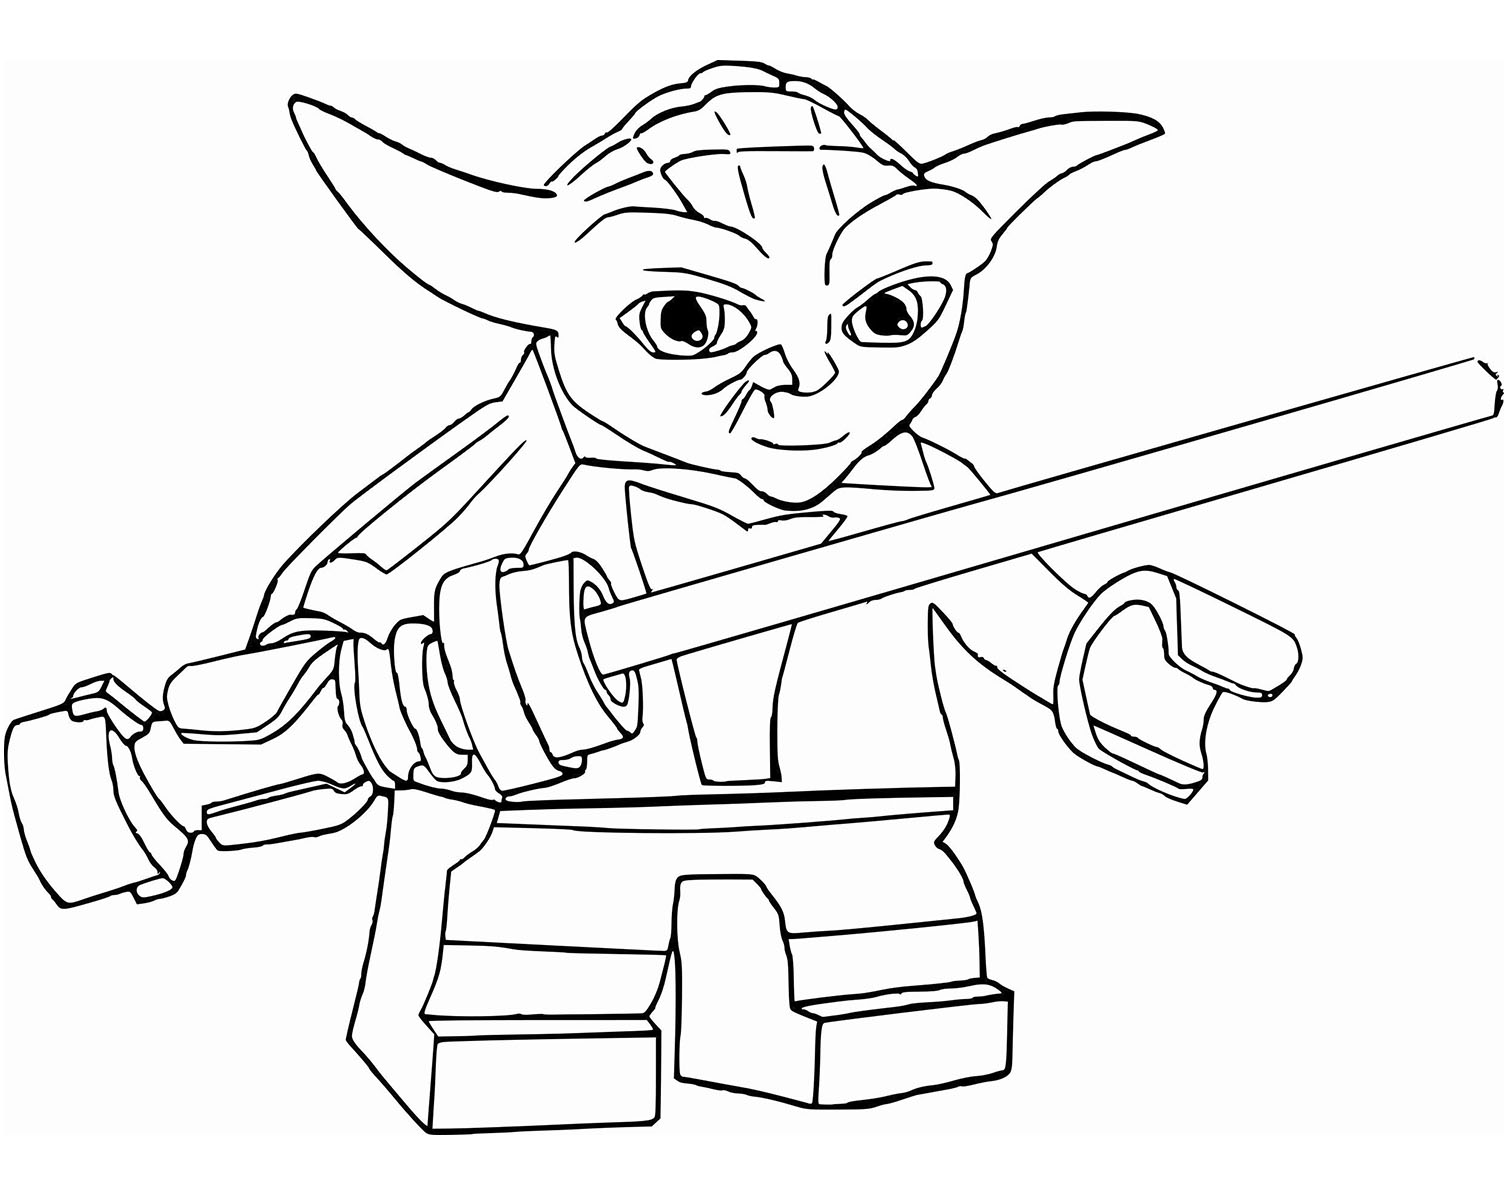 Star Wars : Yoda Lego - Coloriage Star Wars - Coloriages pour enfants